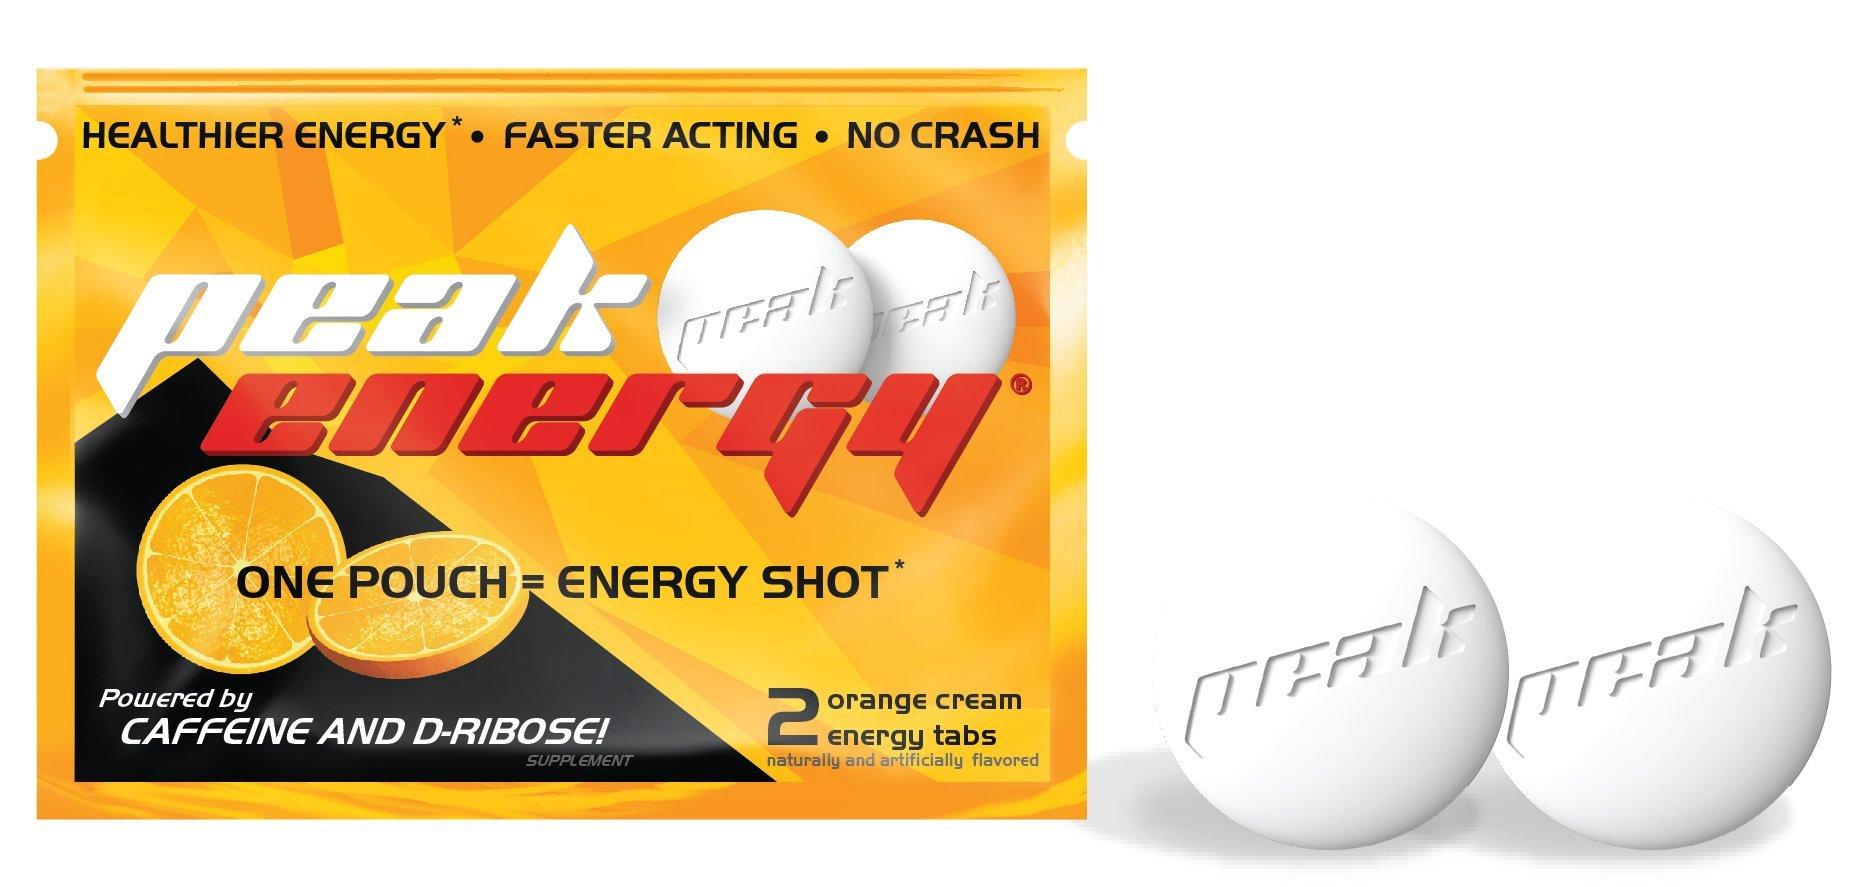 Caffeine and D-Ribose Energy Mints - 100mg Caffeine per mint - 24 Pouch Box - Orange Cream Flavor by Peak Energy (Image #2)